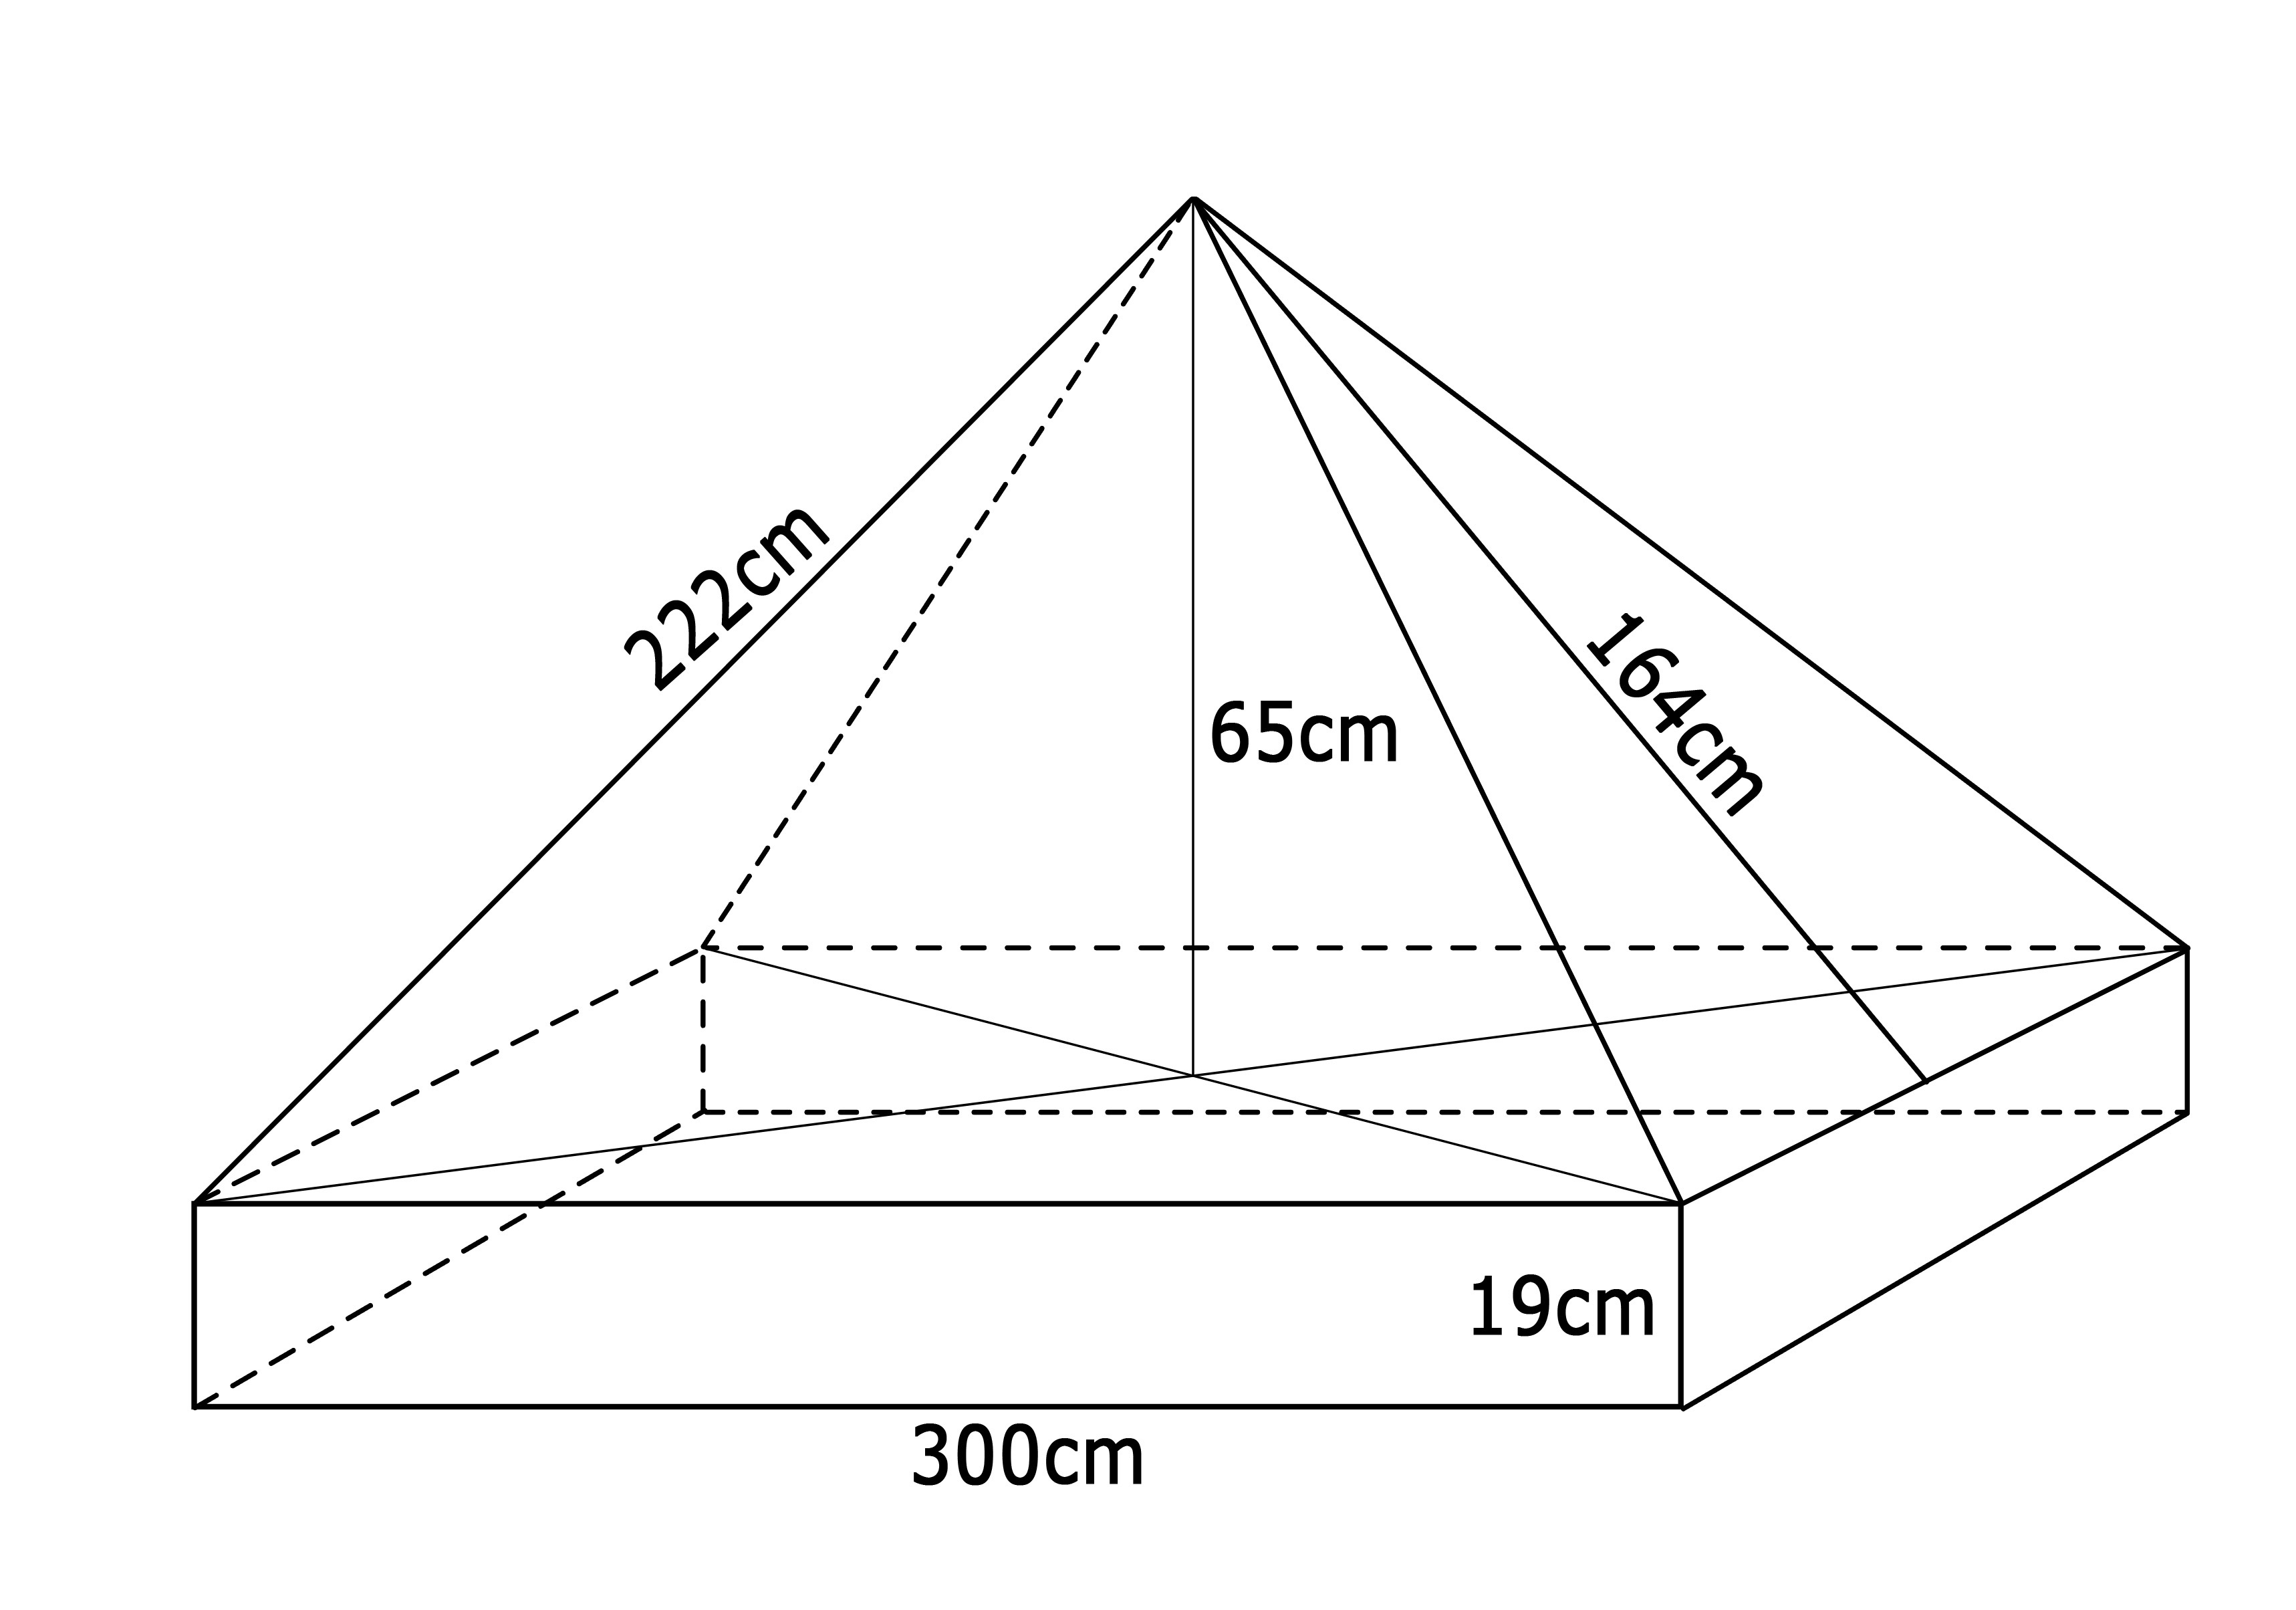 Universal-Ersatzdach für Pavillon 3x3 Meter, bordeaux